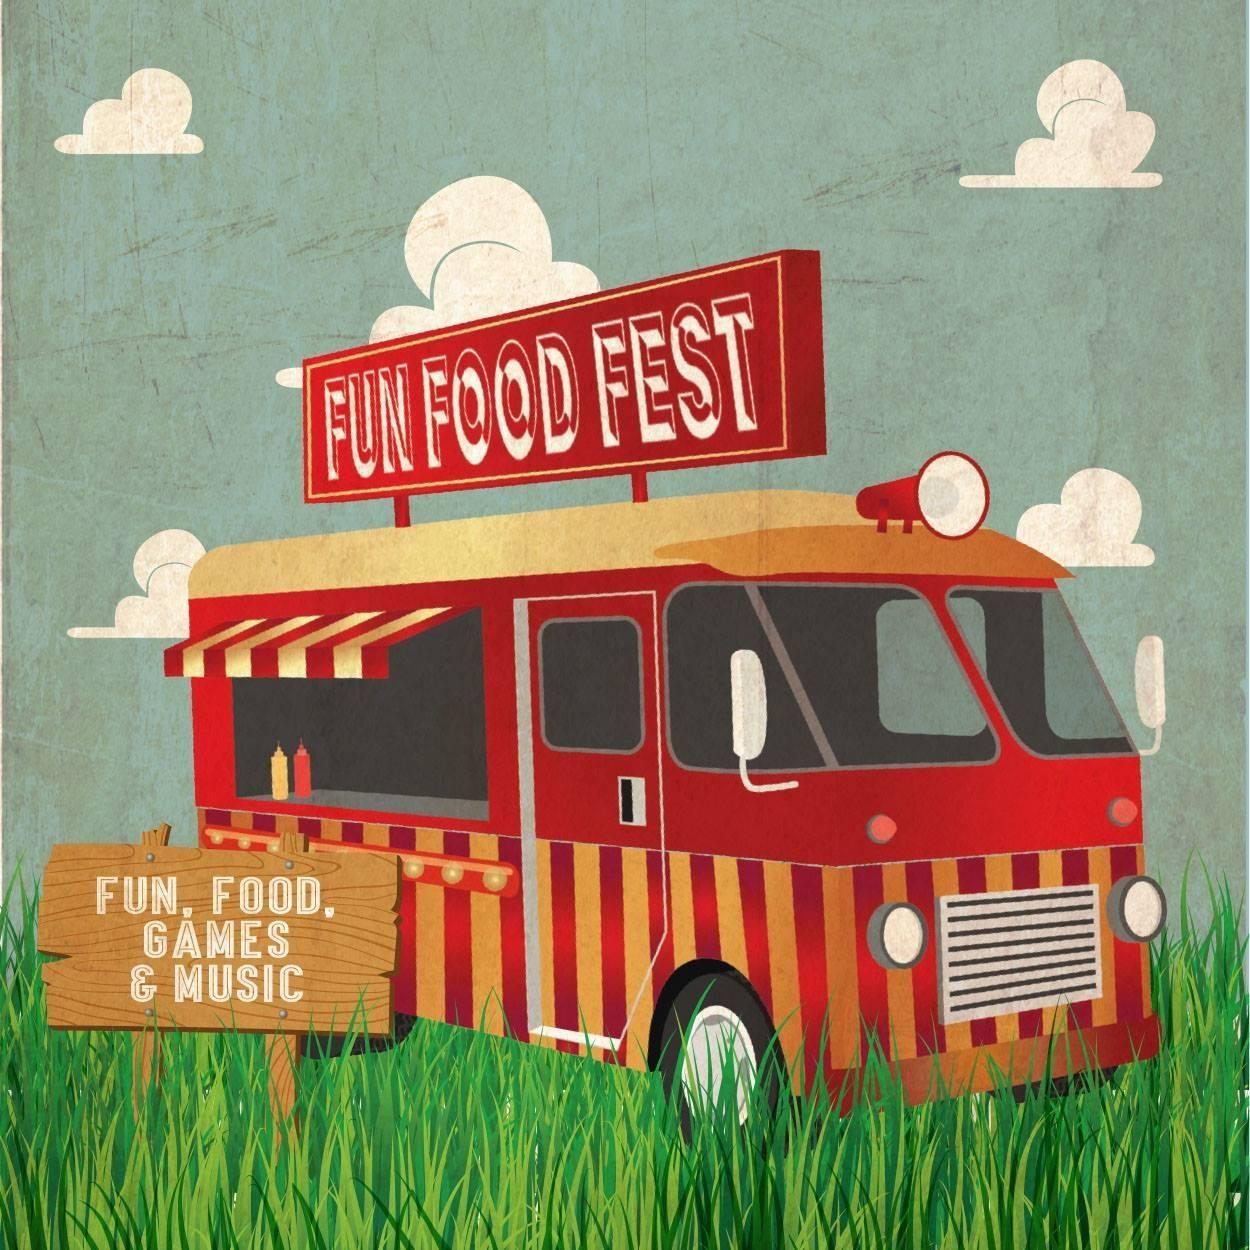 The Fun Food Fest